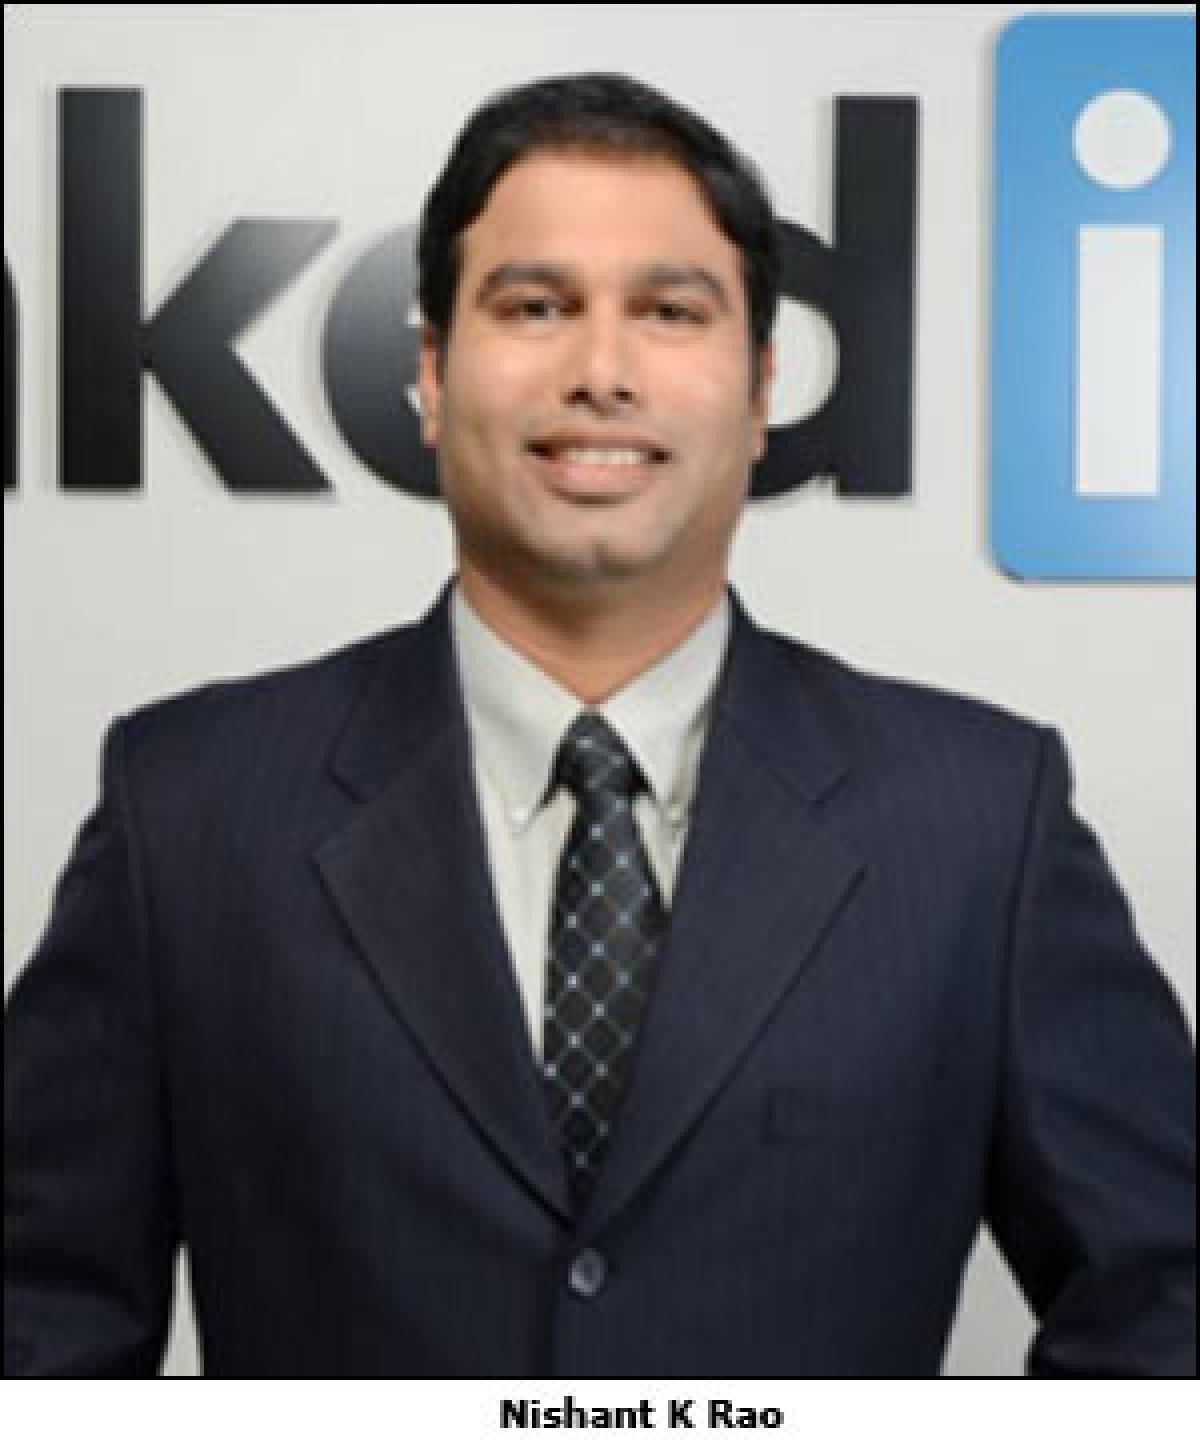 LinkedIn names Nishant K Rao as country manager, India